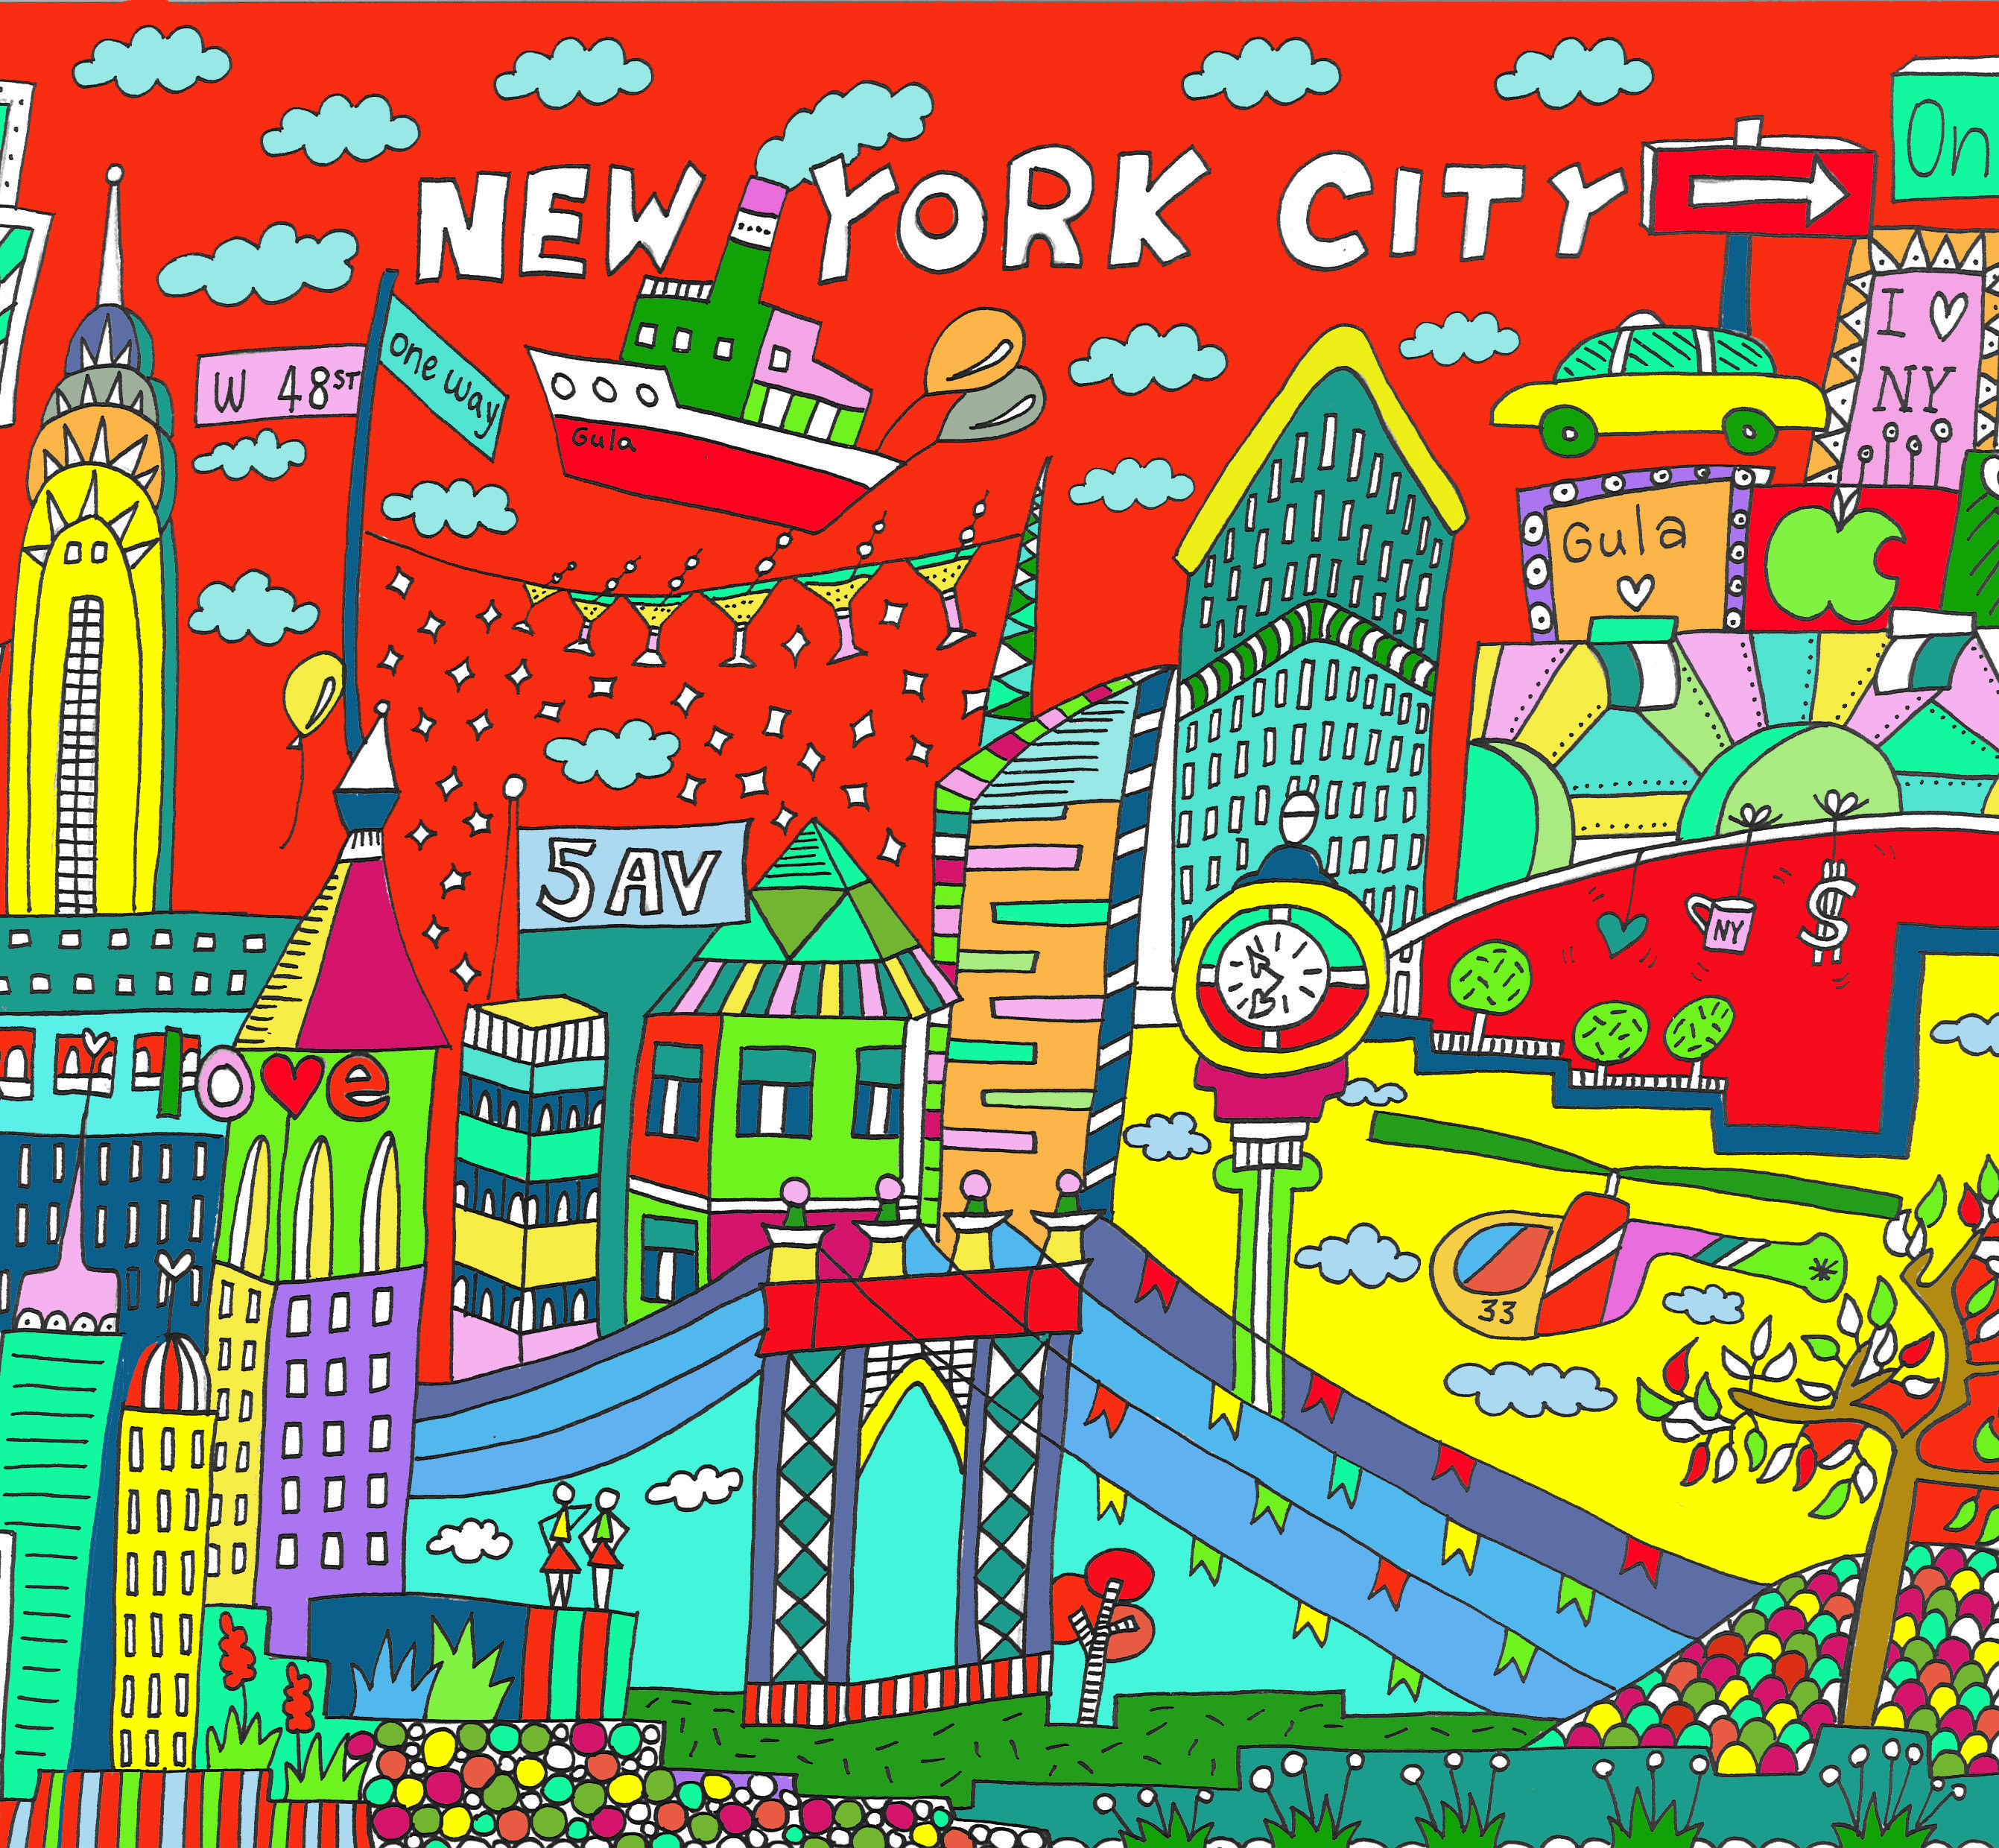 gula design: I love new york city